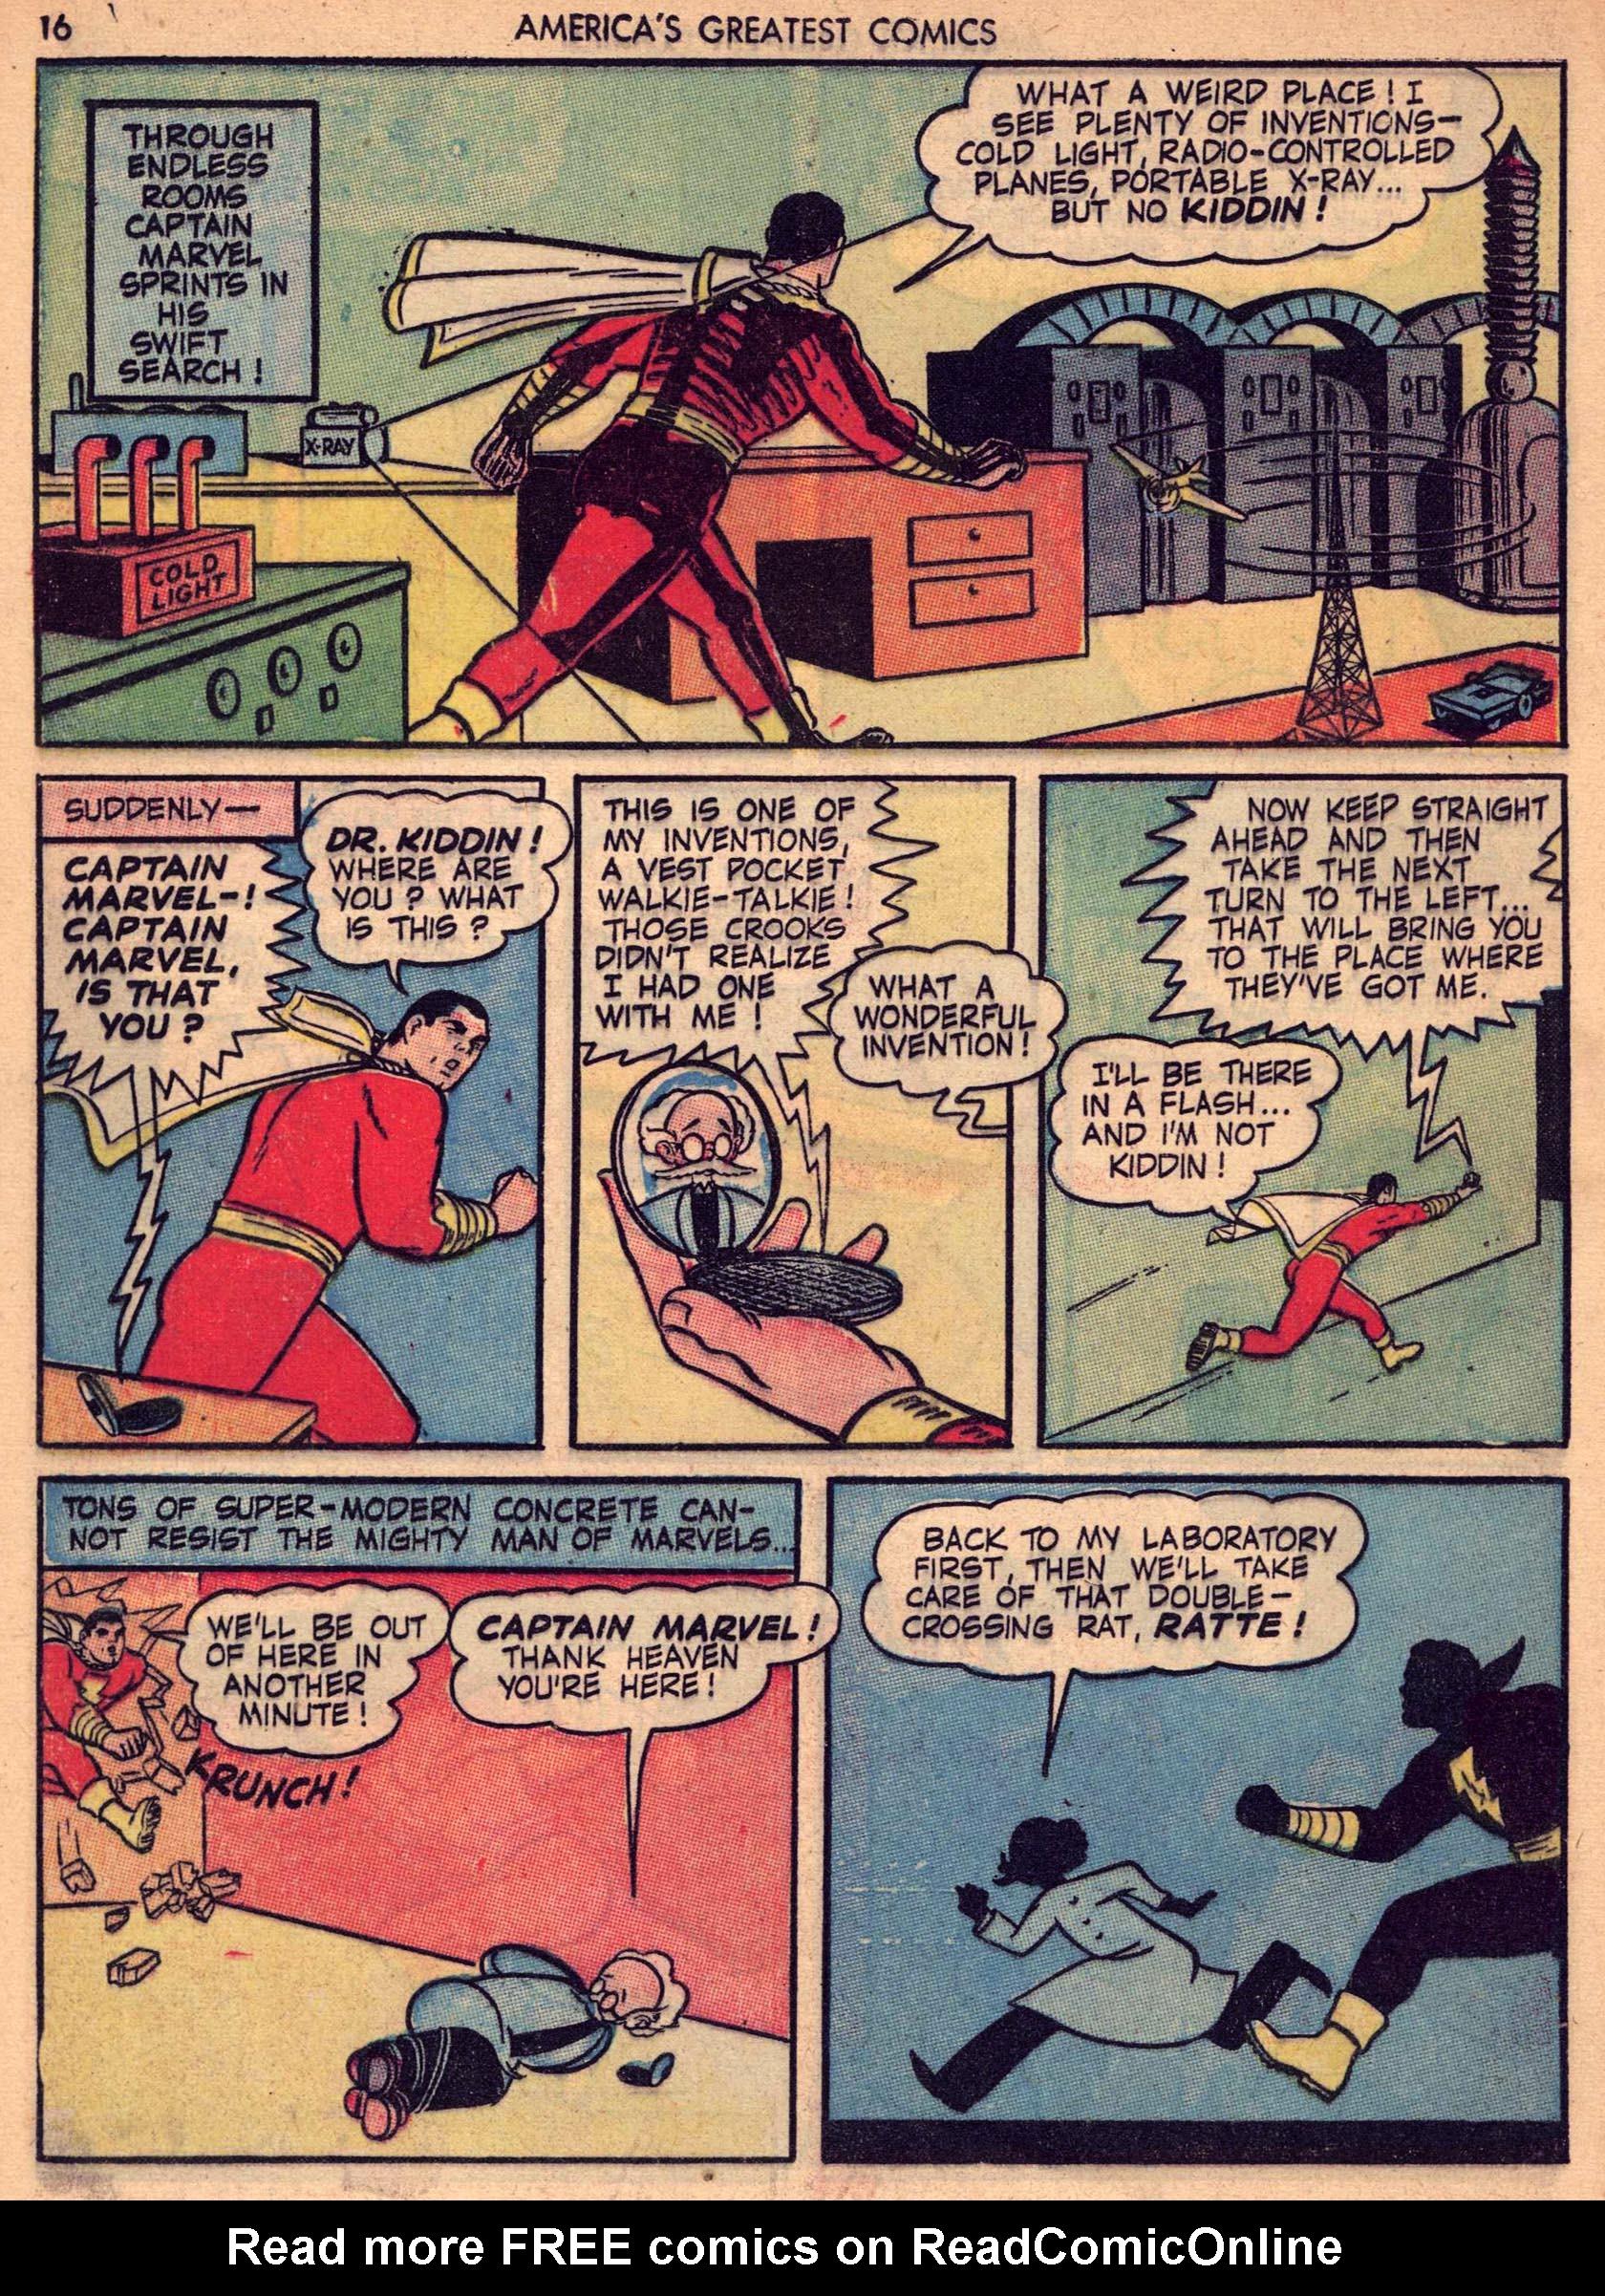 Read online America's Greatest Comics comic -  Issue #7 - 15